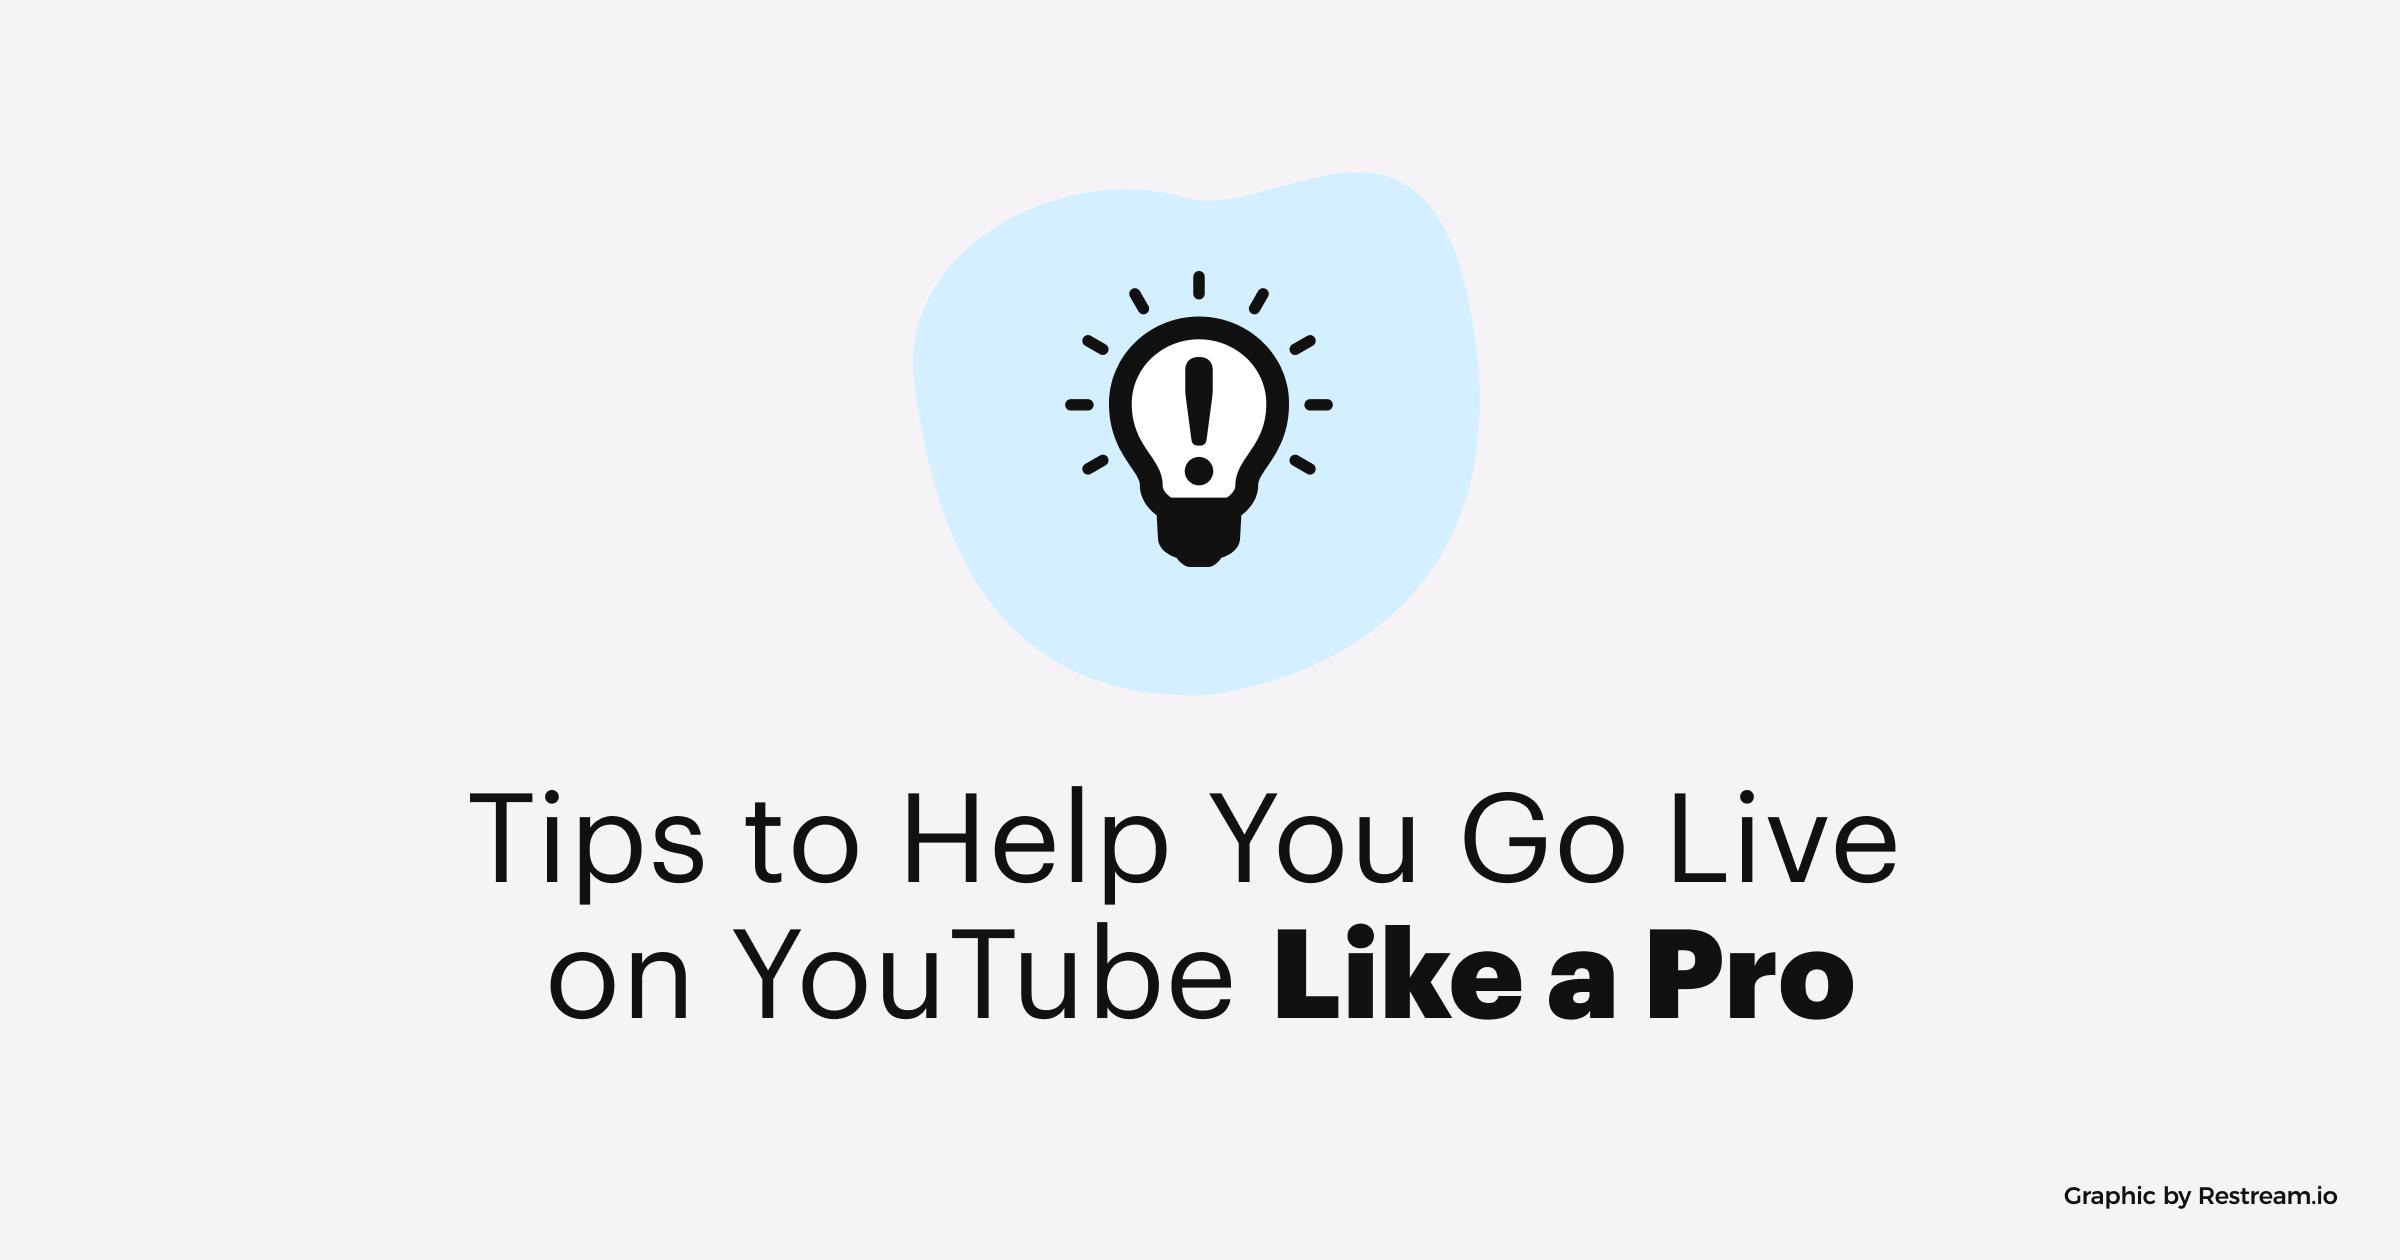 Tips to Help You Go Live to YouTube Like a Pro